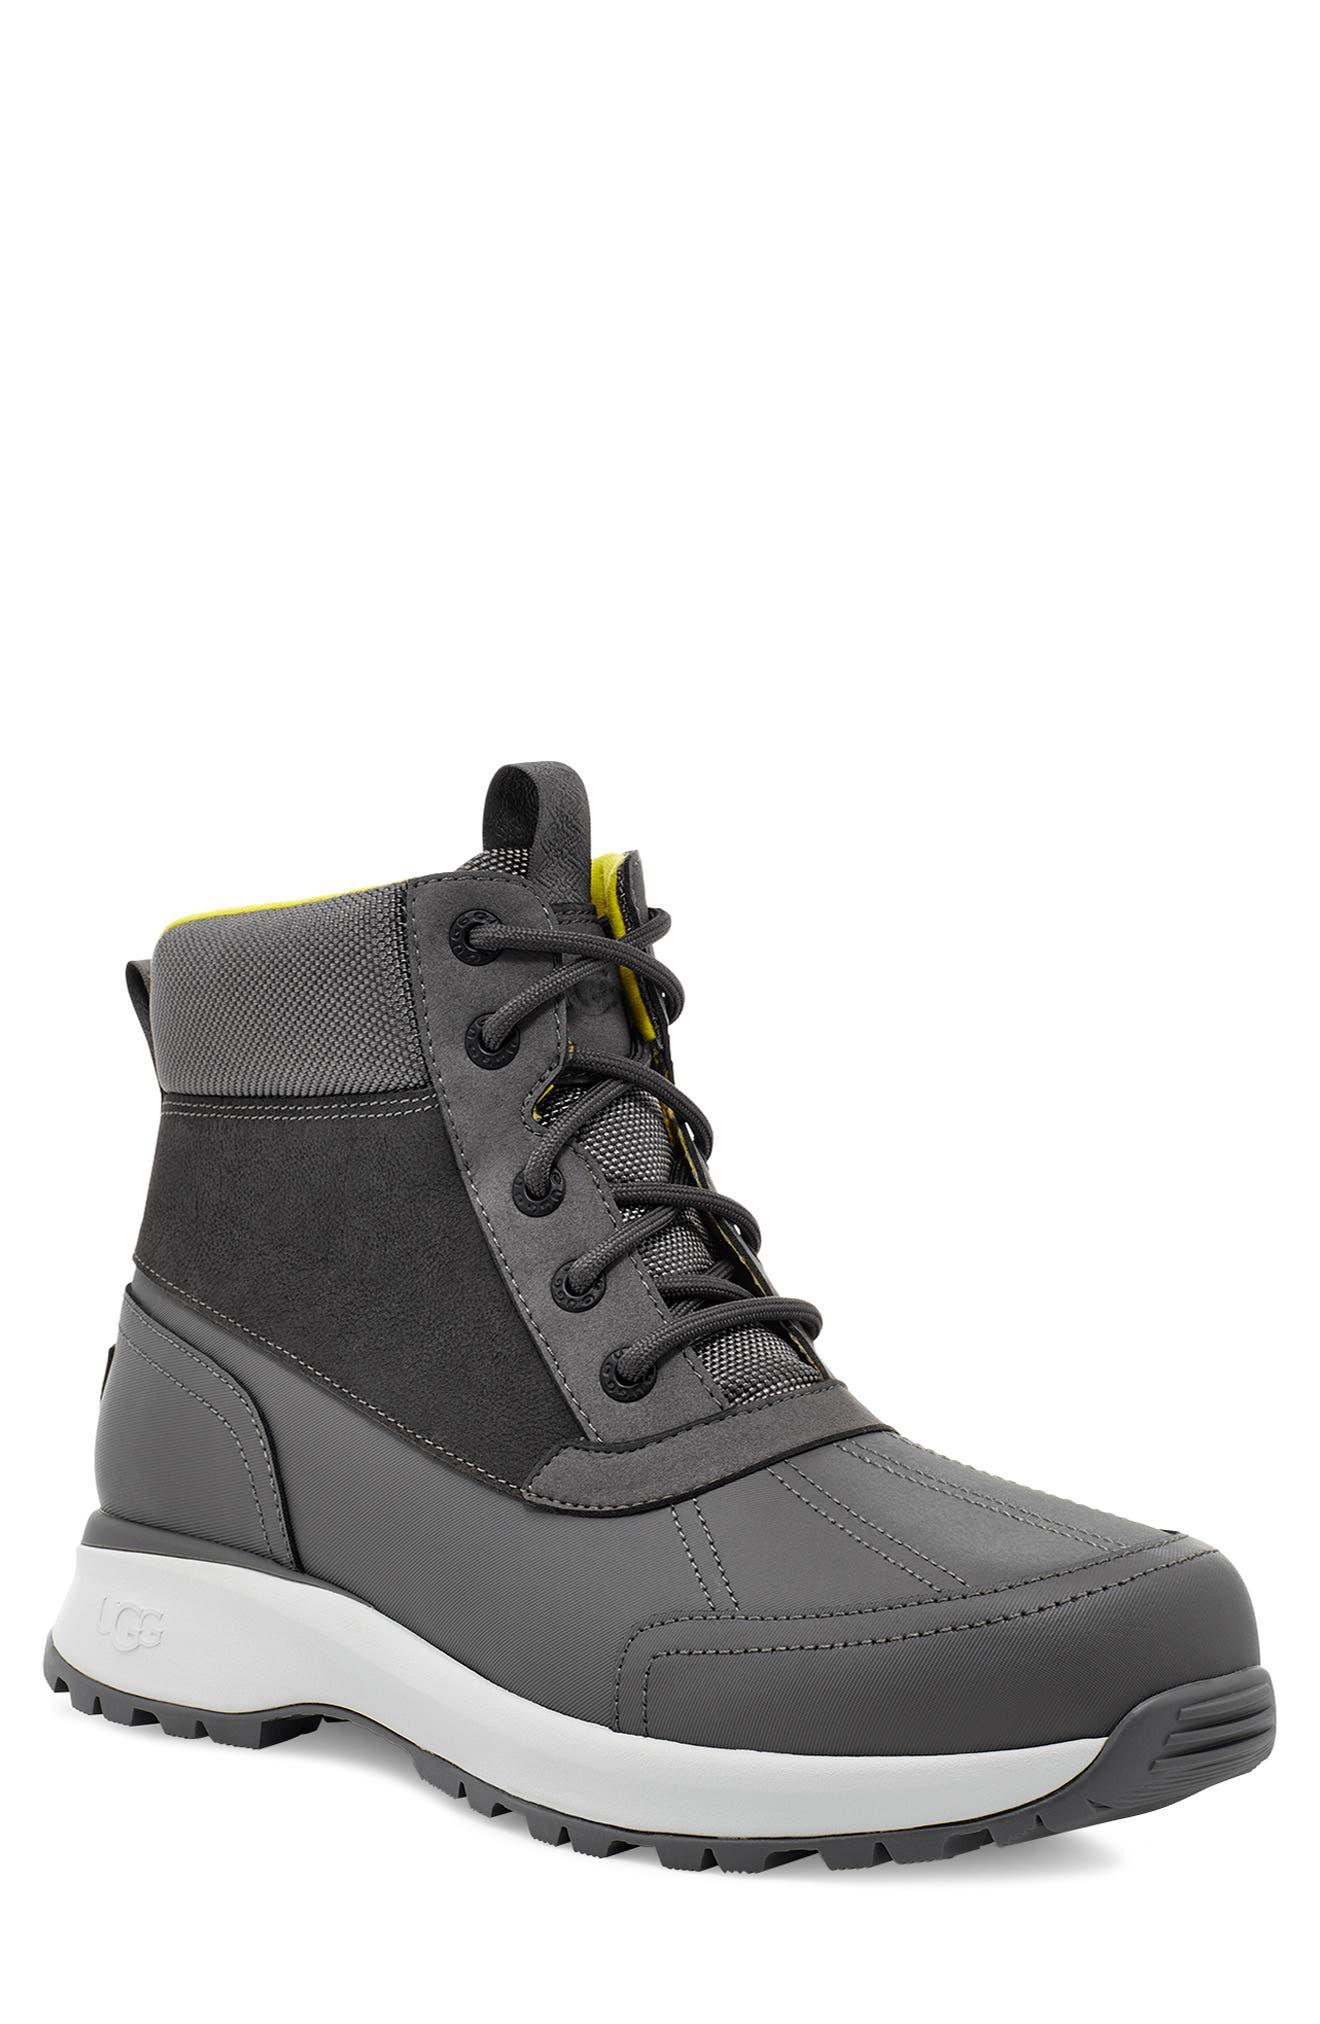 Mens Grey Boots | Nordstrom